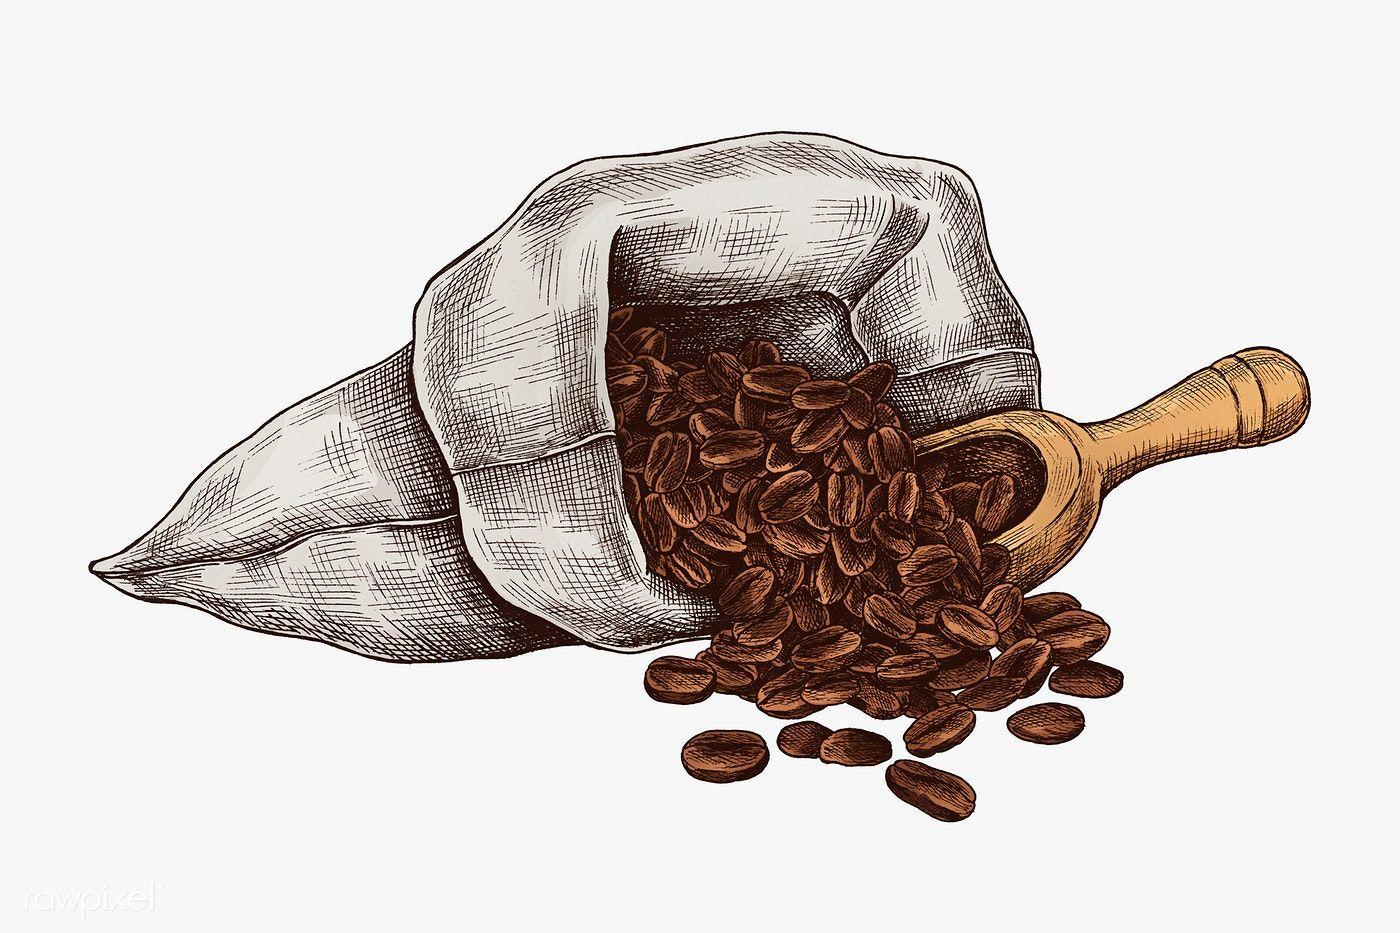 Download Premium Illustration Of Hand Drawn Coffee Beans In A Bag 1208984 Coffee Bean Art Coffee Beans Coffee Illustration Wallpaper coffee beans coffee ice hand